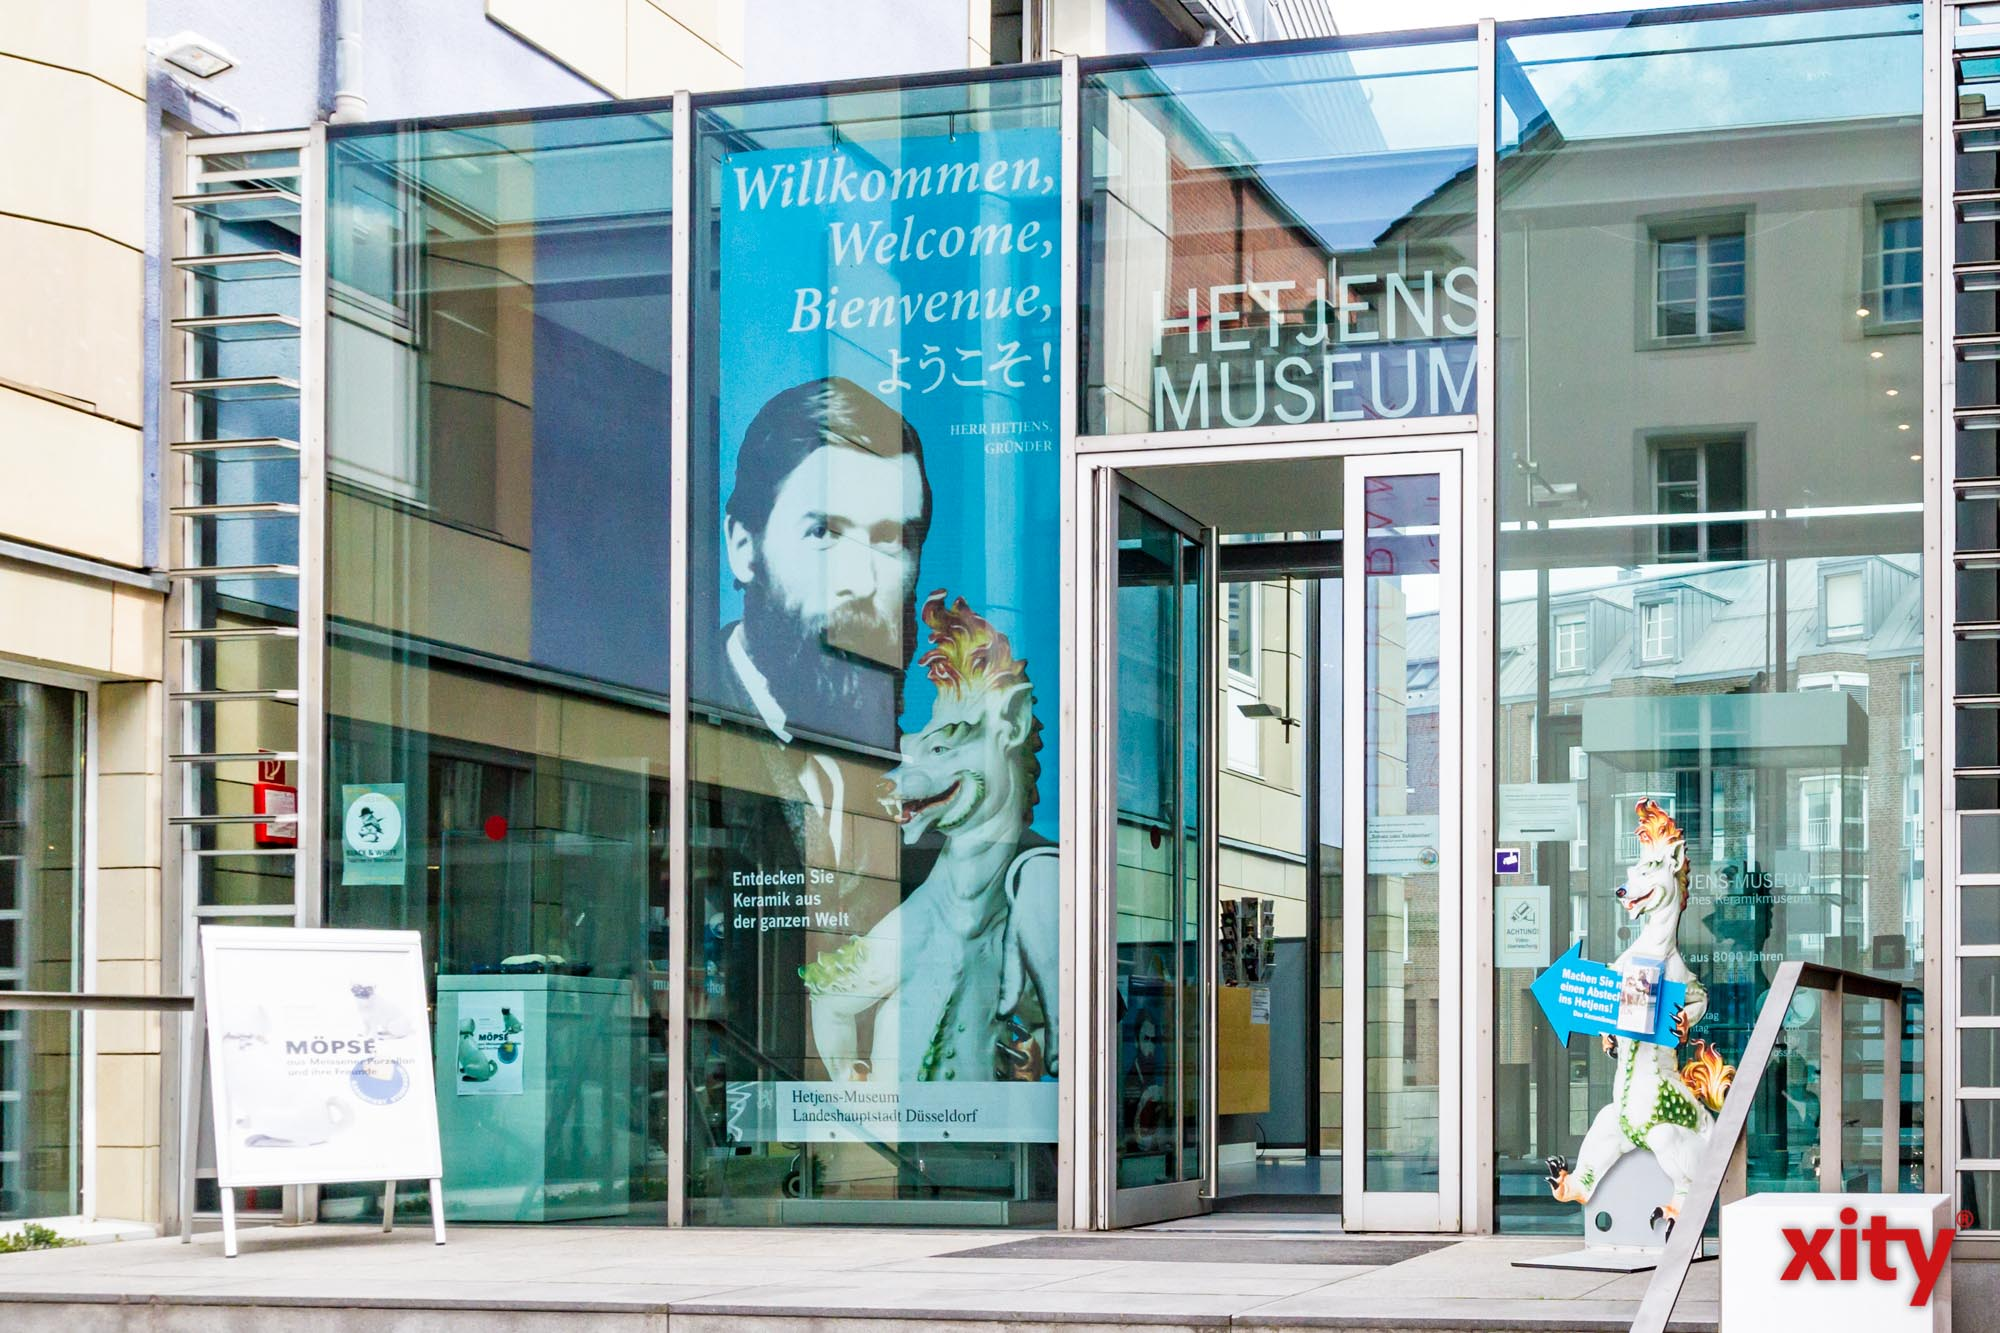 Öffentliche Kuratorenführung im Hetjens-Museum Düsseldorf (Foto: xity)